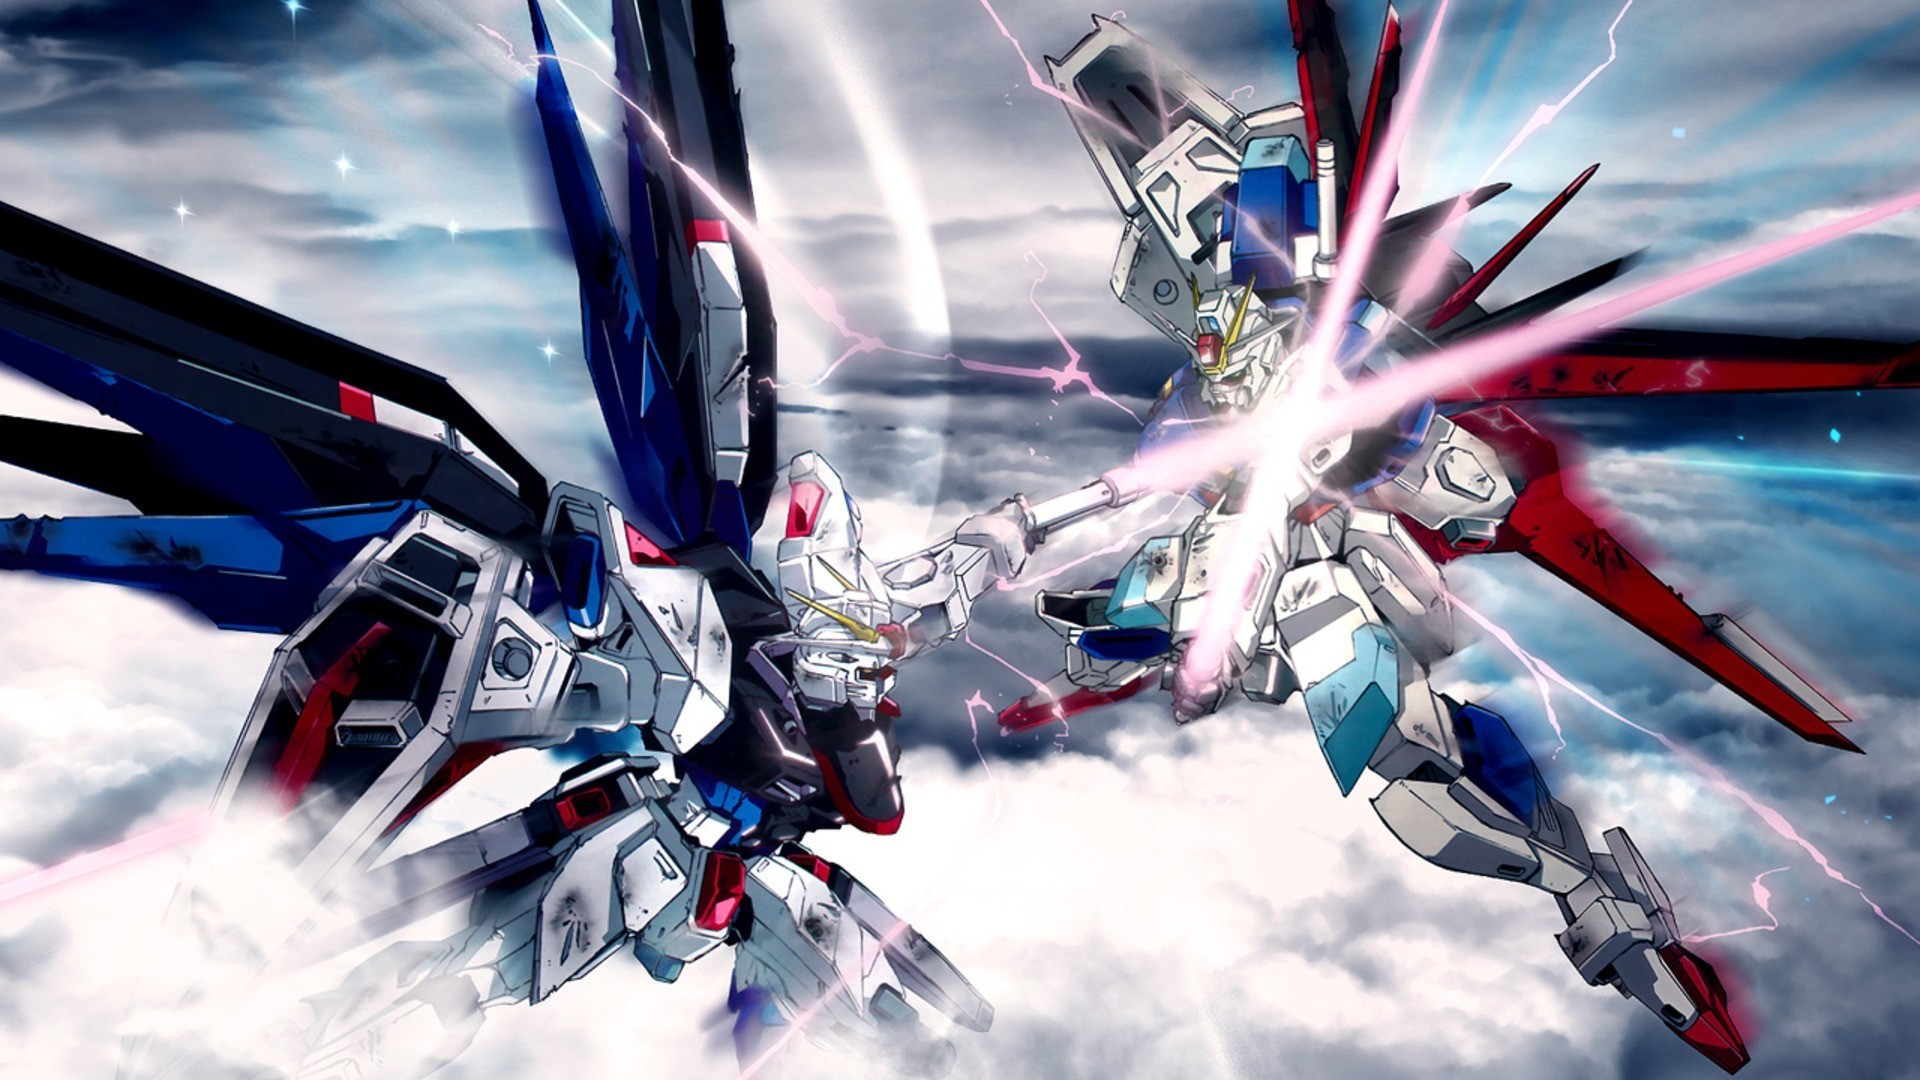 Suit Gundam Seed Destiny Wallpaper   Full HD Wallpapers .